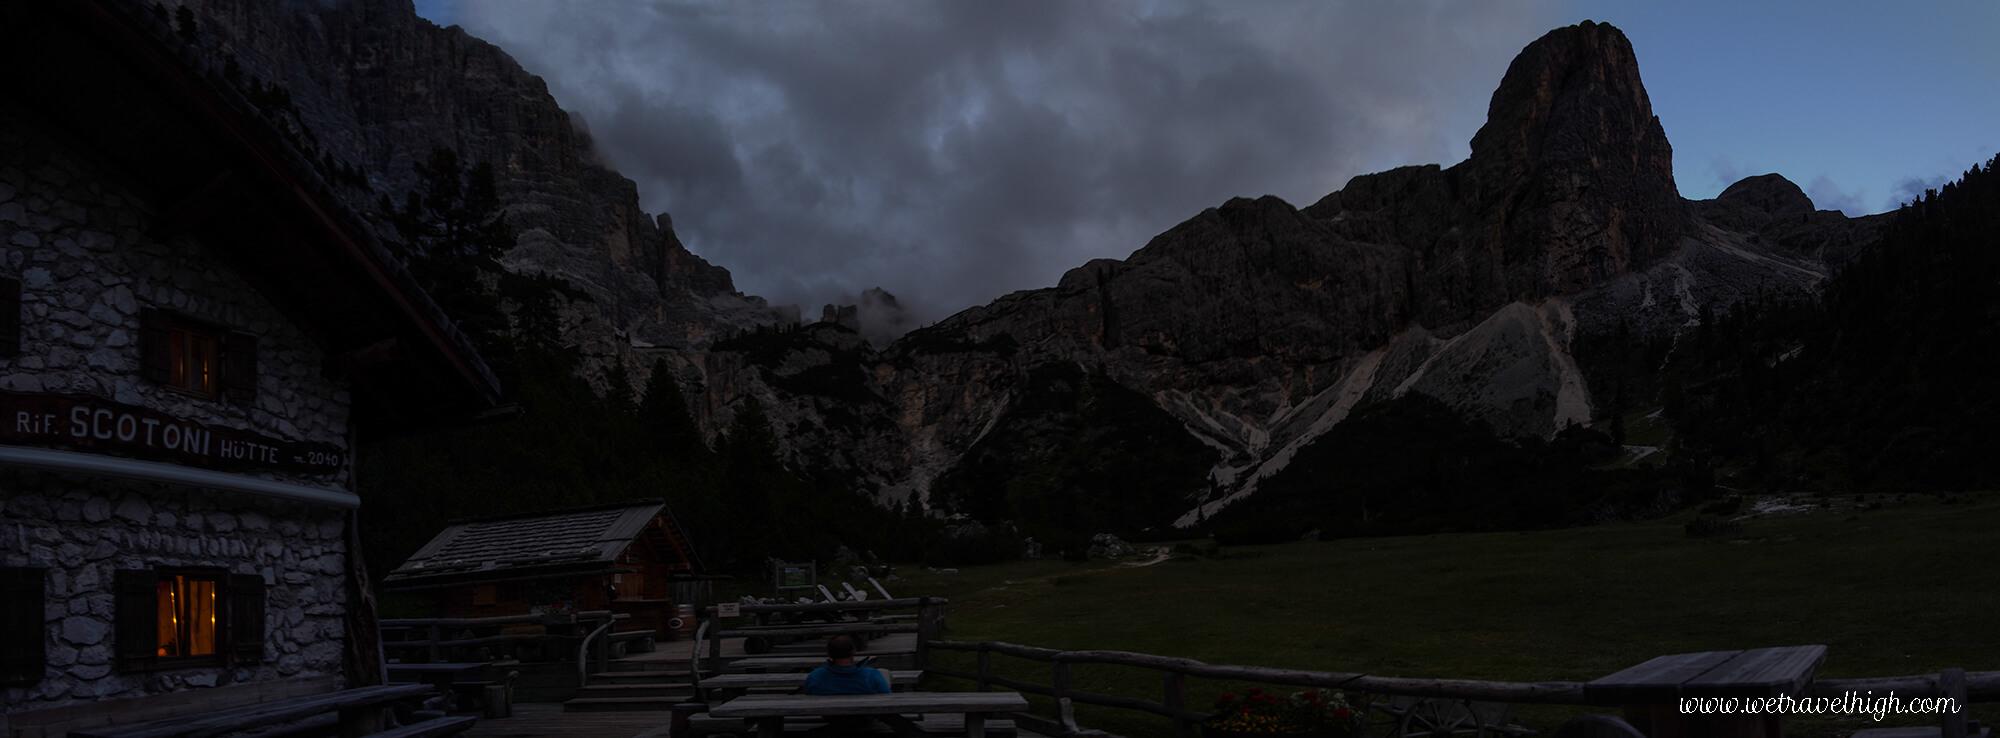 Panoramica notturna dal Rifugio Scotoni